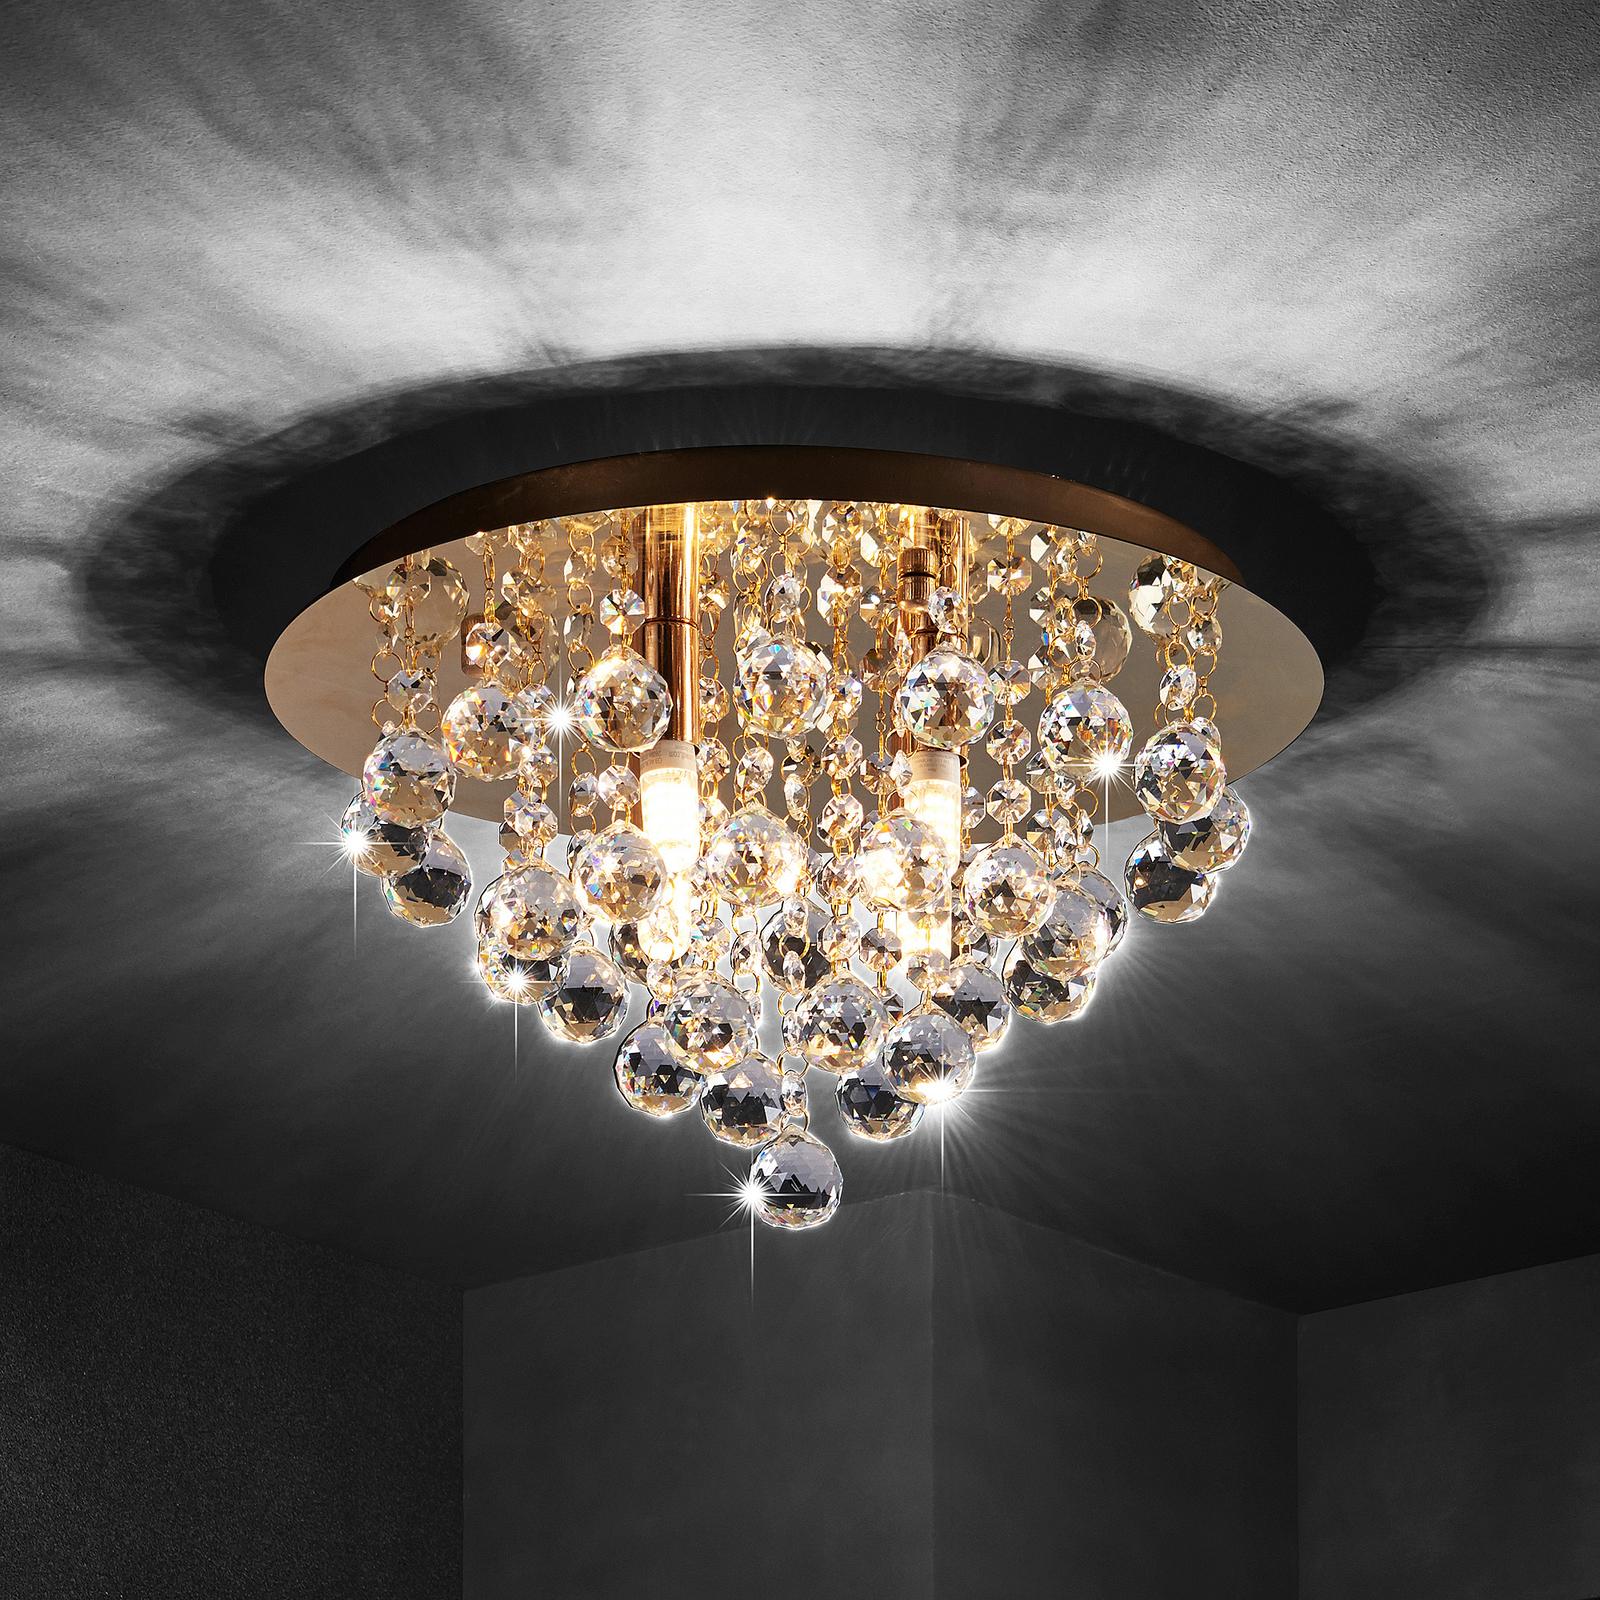 Lindby Gillion taklampa, 4 lampor